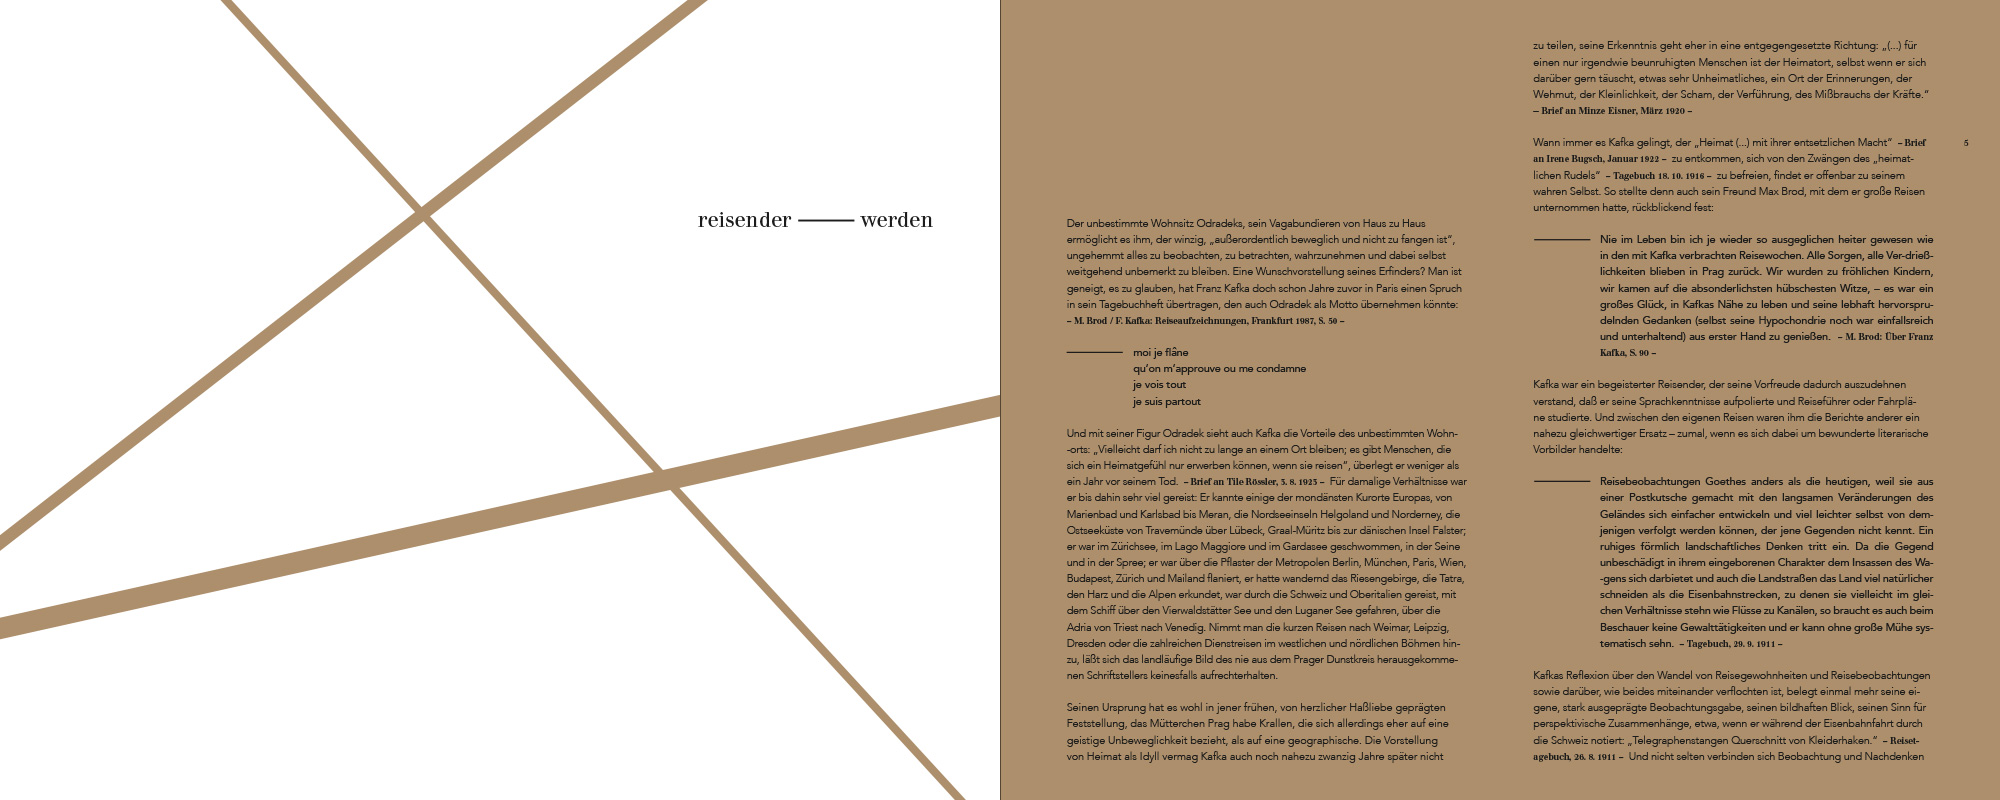 [album/Products_Model_Product/69/Kafka_Cesty_2-8.jpg]